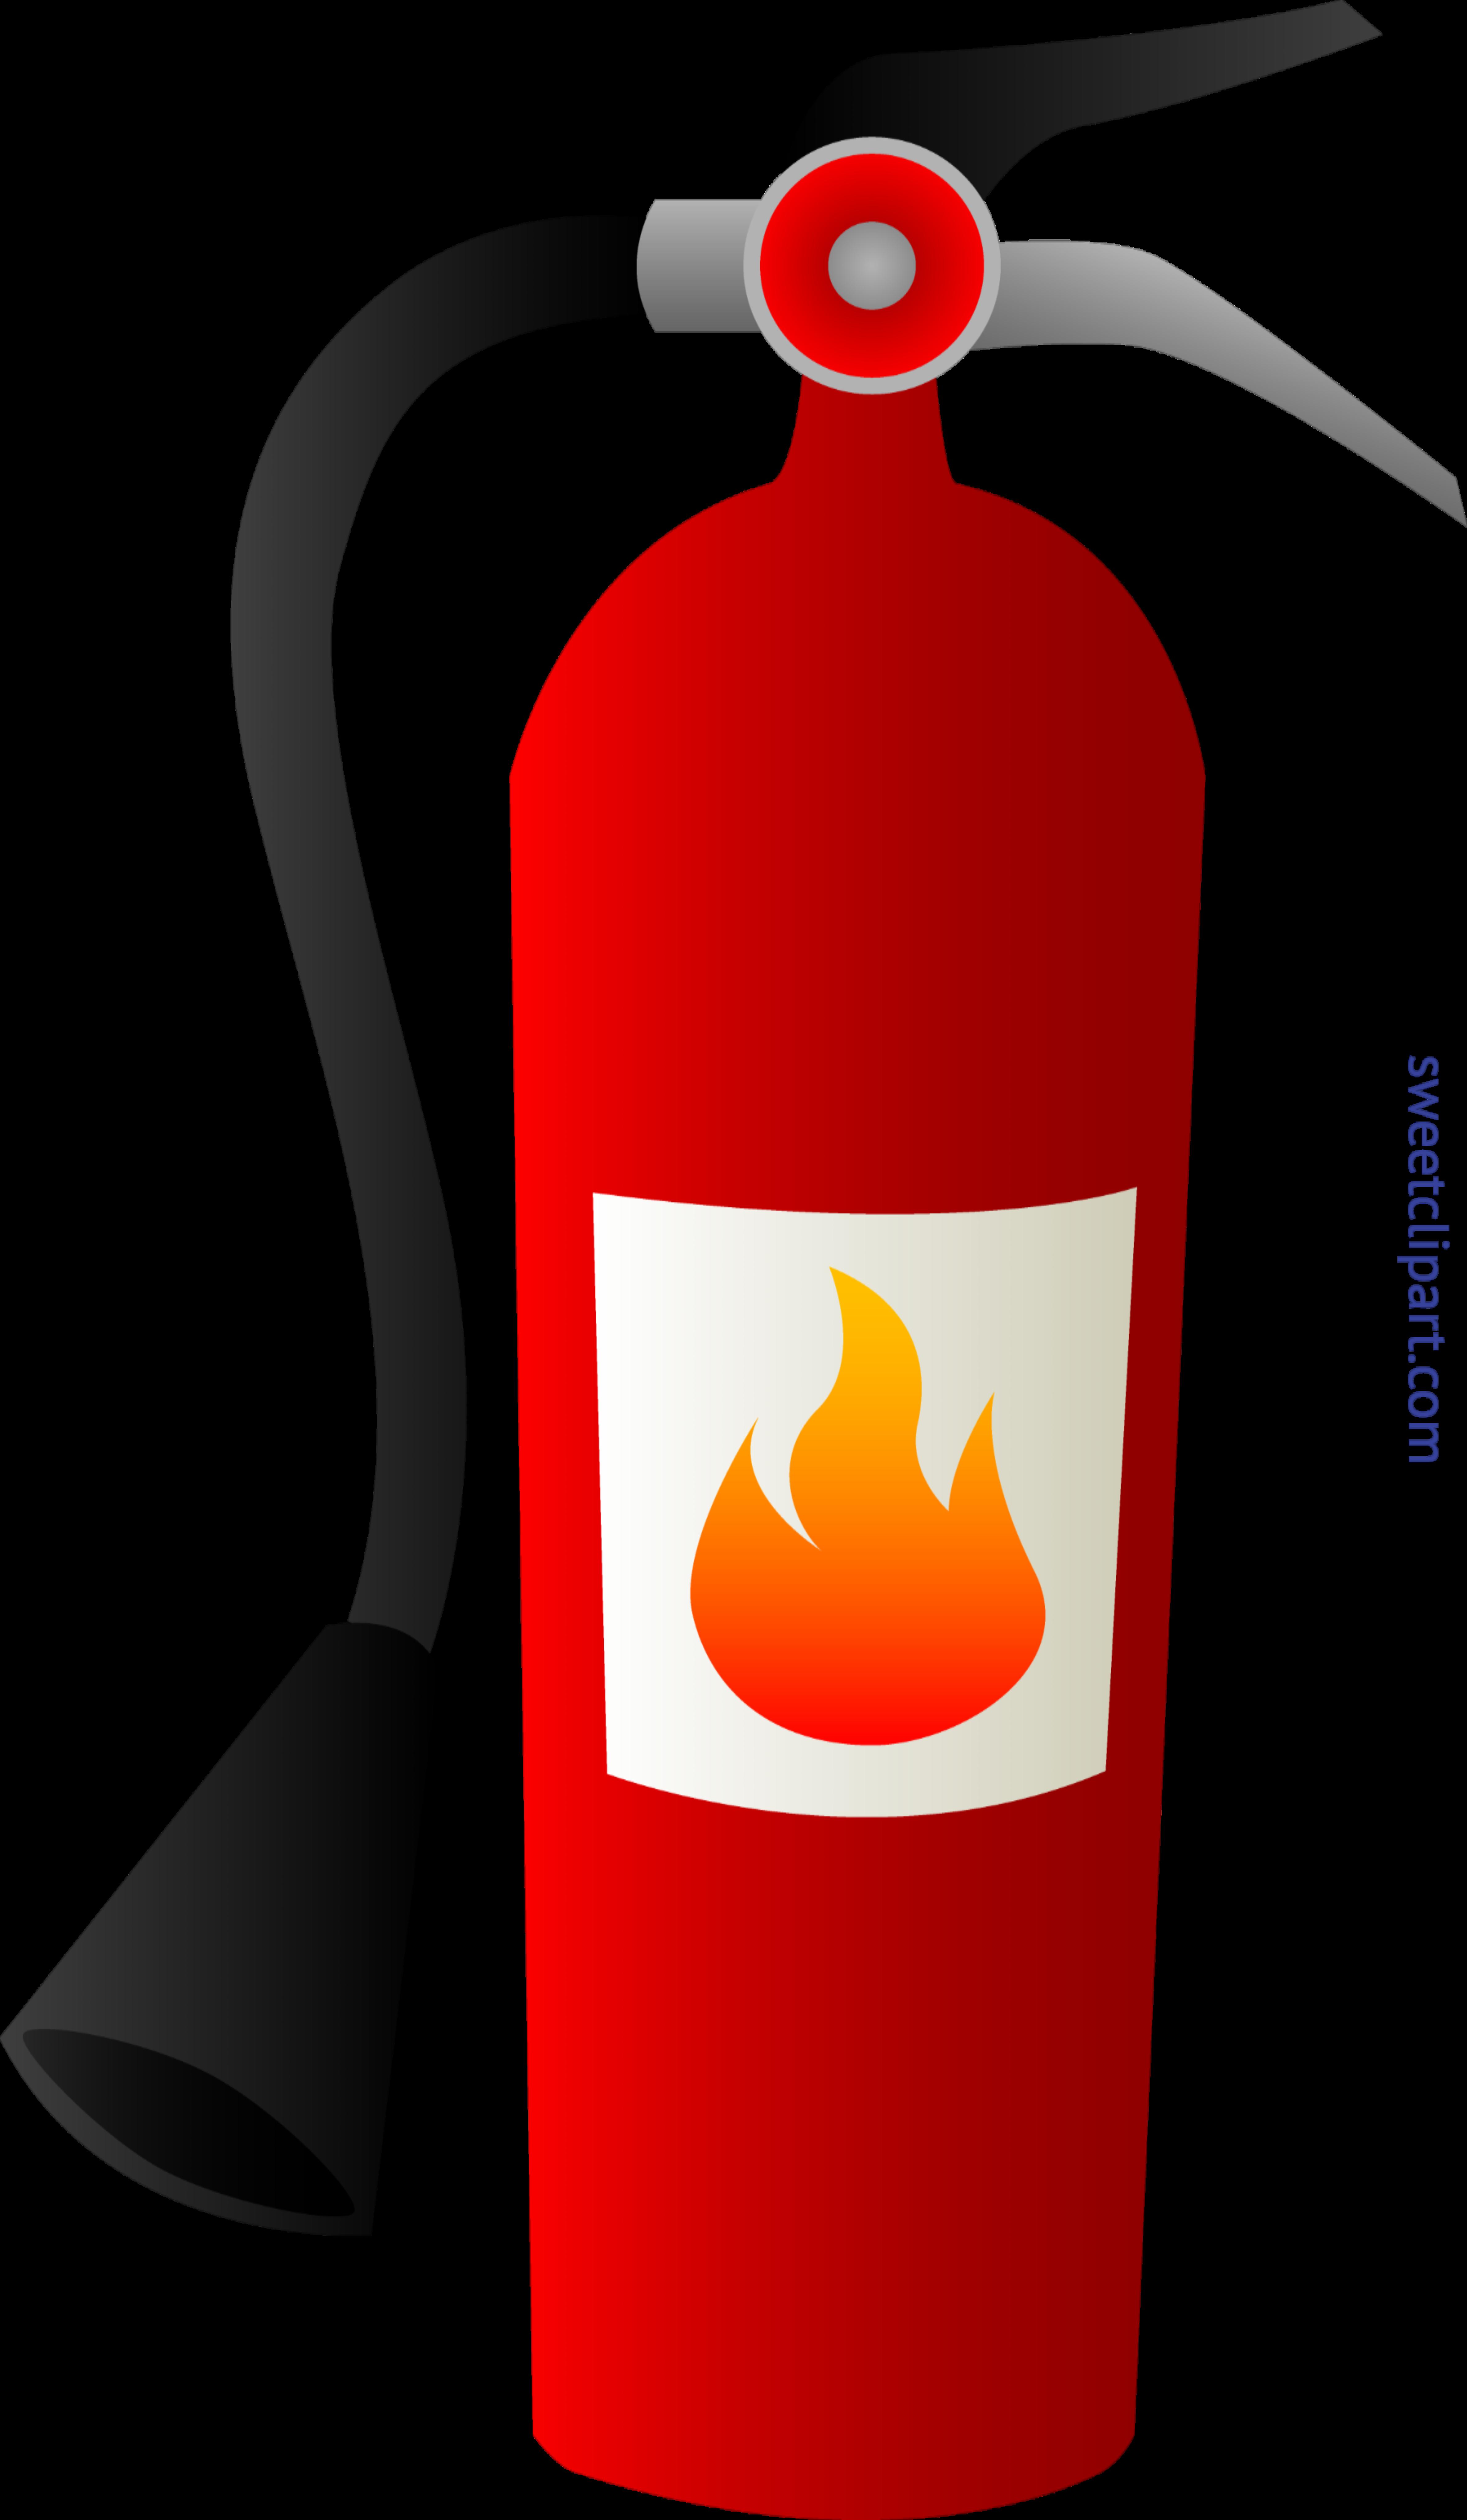 Fireplace clipart cute. Fire extinguisher clip art